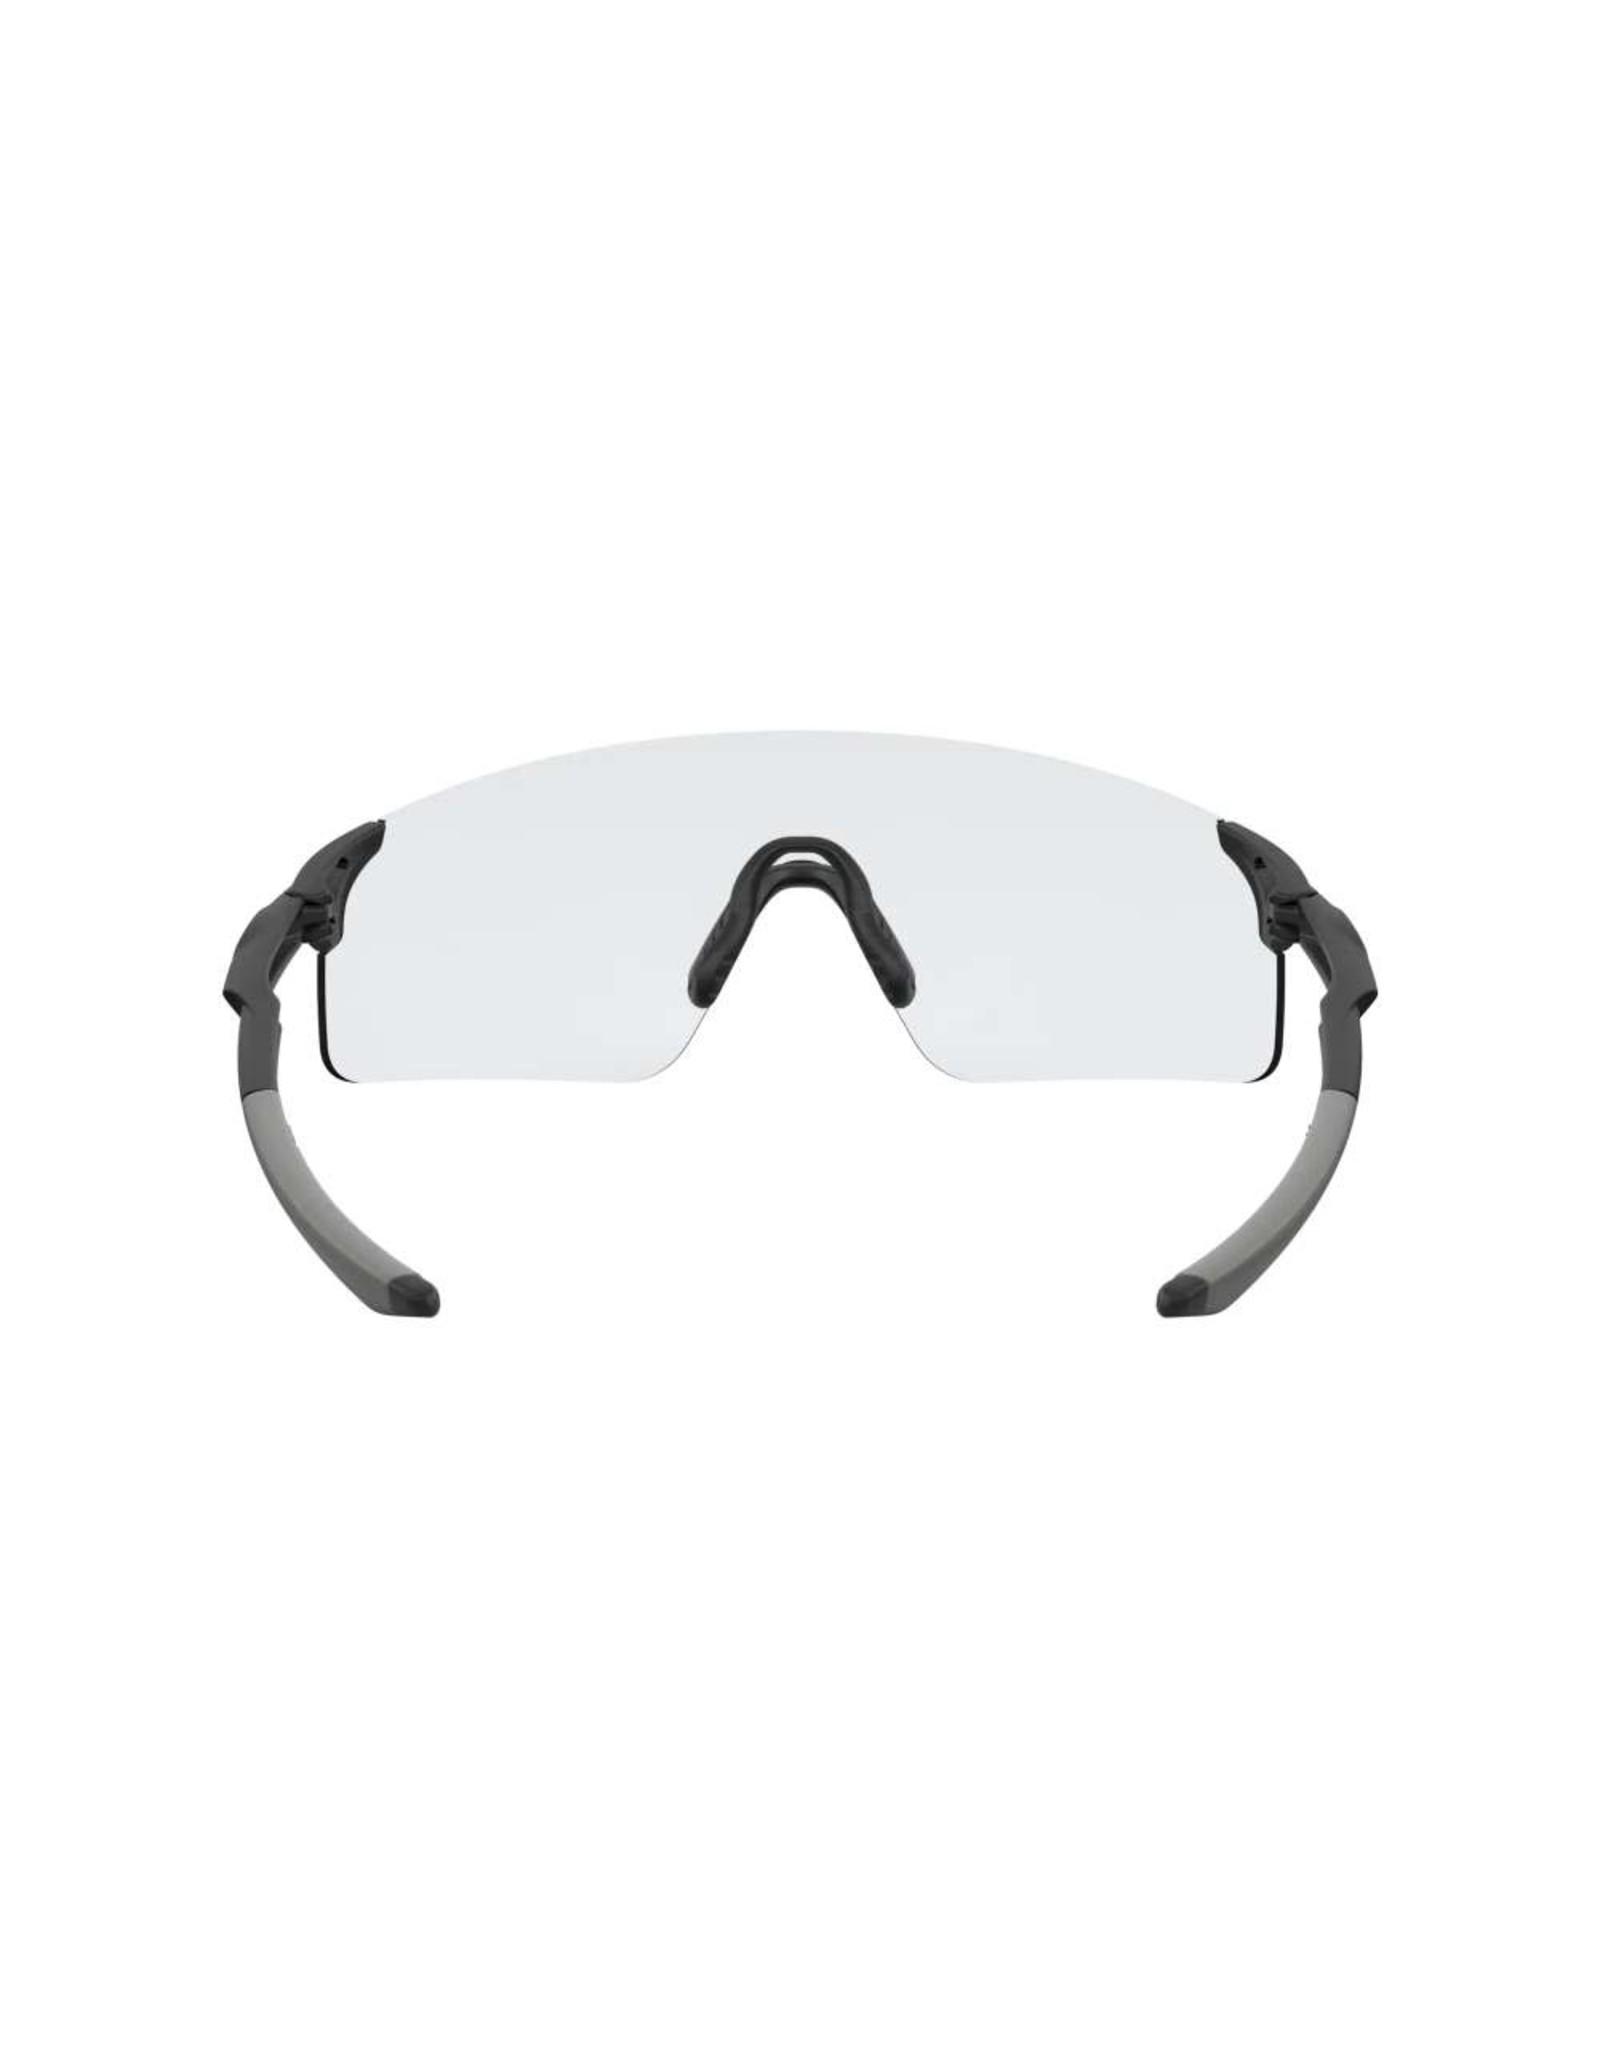 OAKLEY Oakley EVZero Blades (A) matte black w prizm dark golf sunglasses